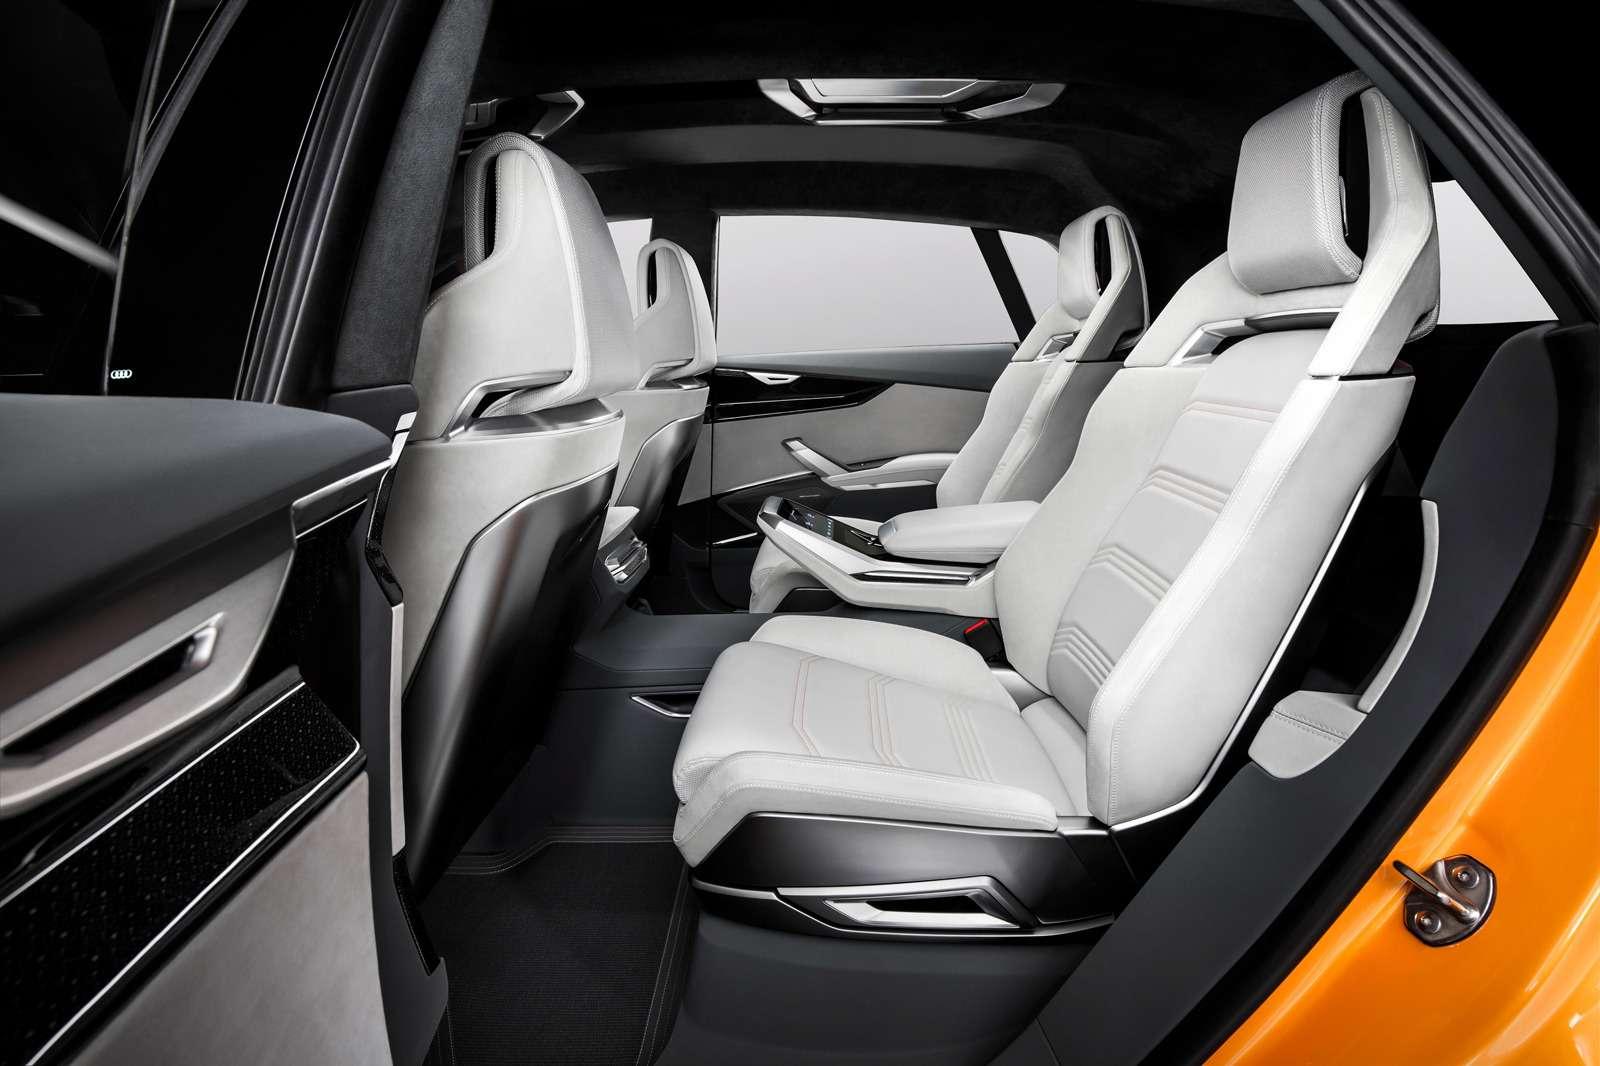 Концепт-тюнинг: Audi Q8приехал вЖеневу сэлектрическим наддувом— фото 717694